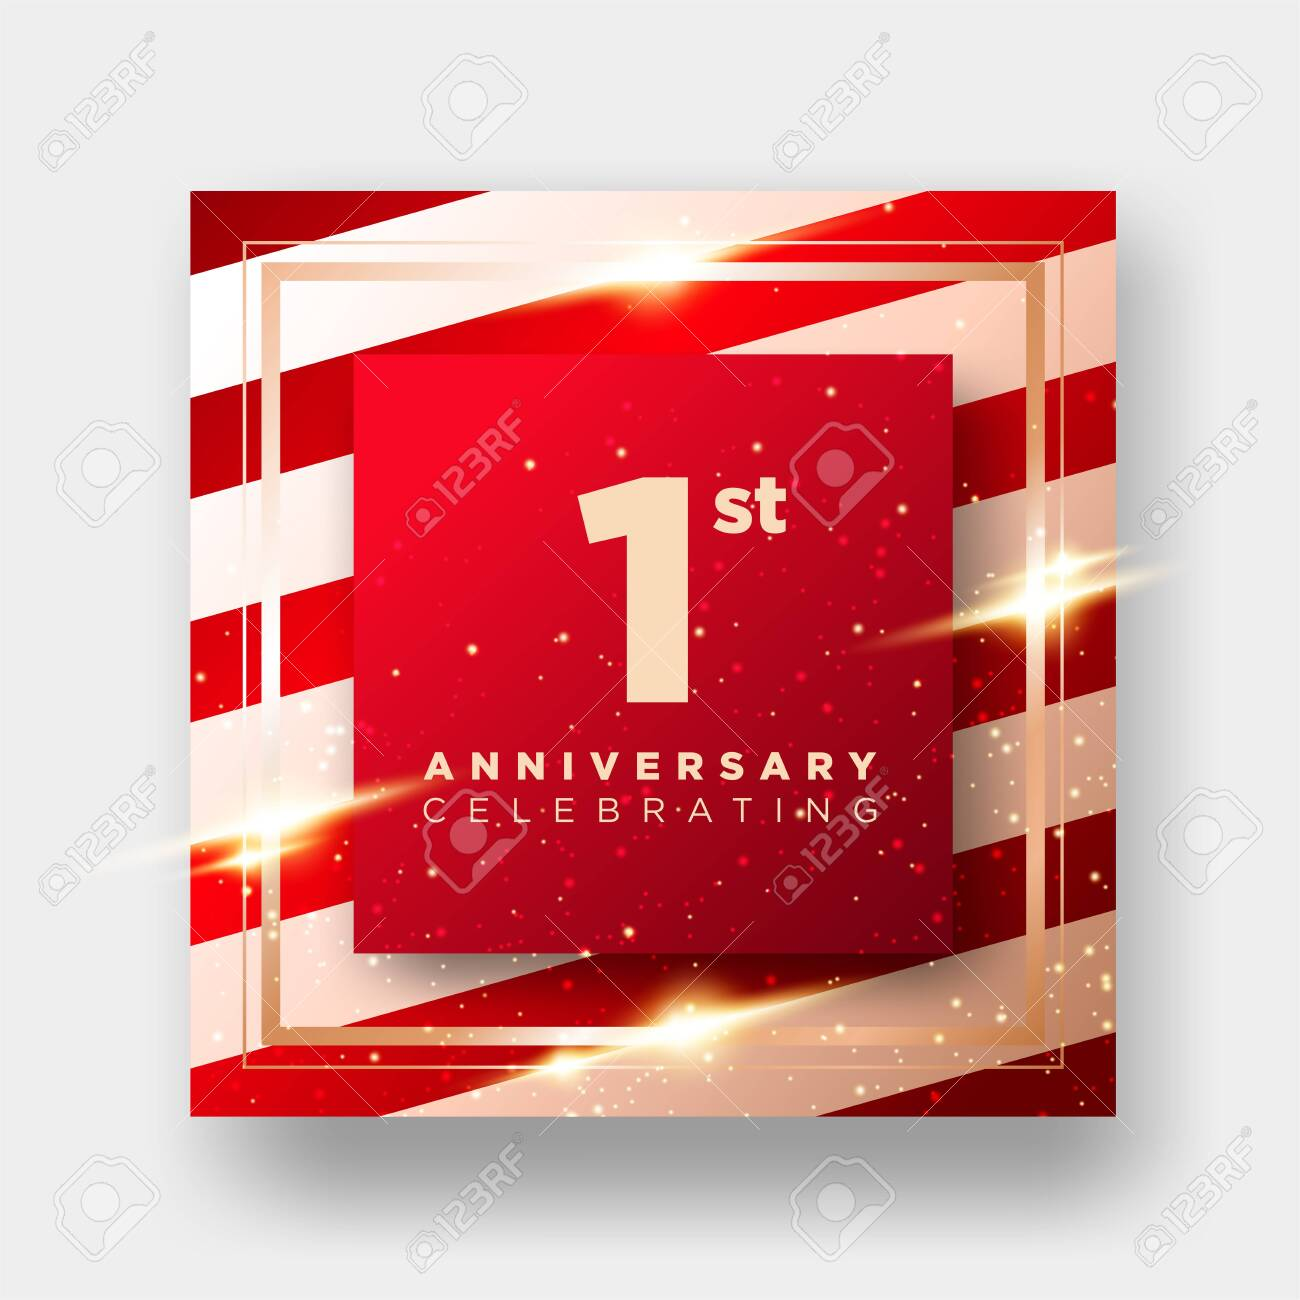 1 year anniversary celebration vector card 1st anniversary luxury